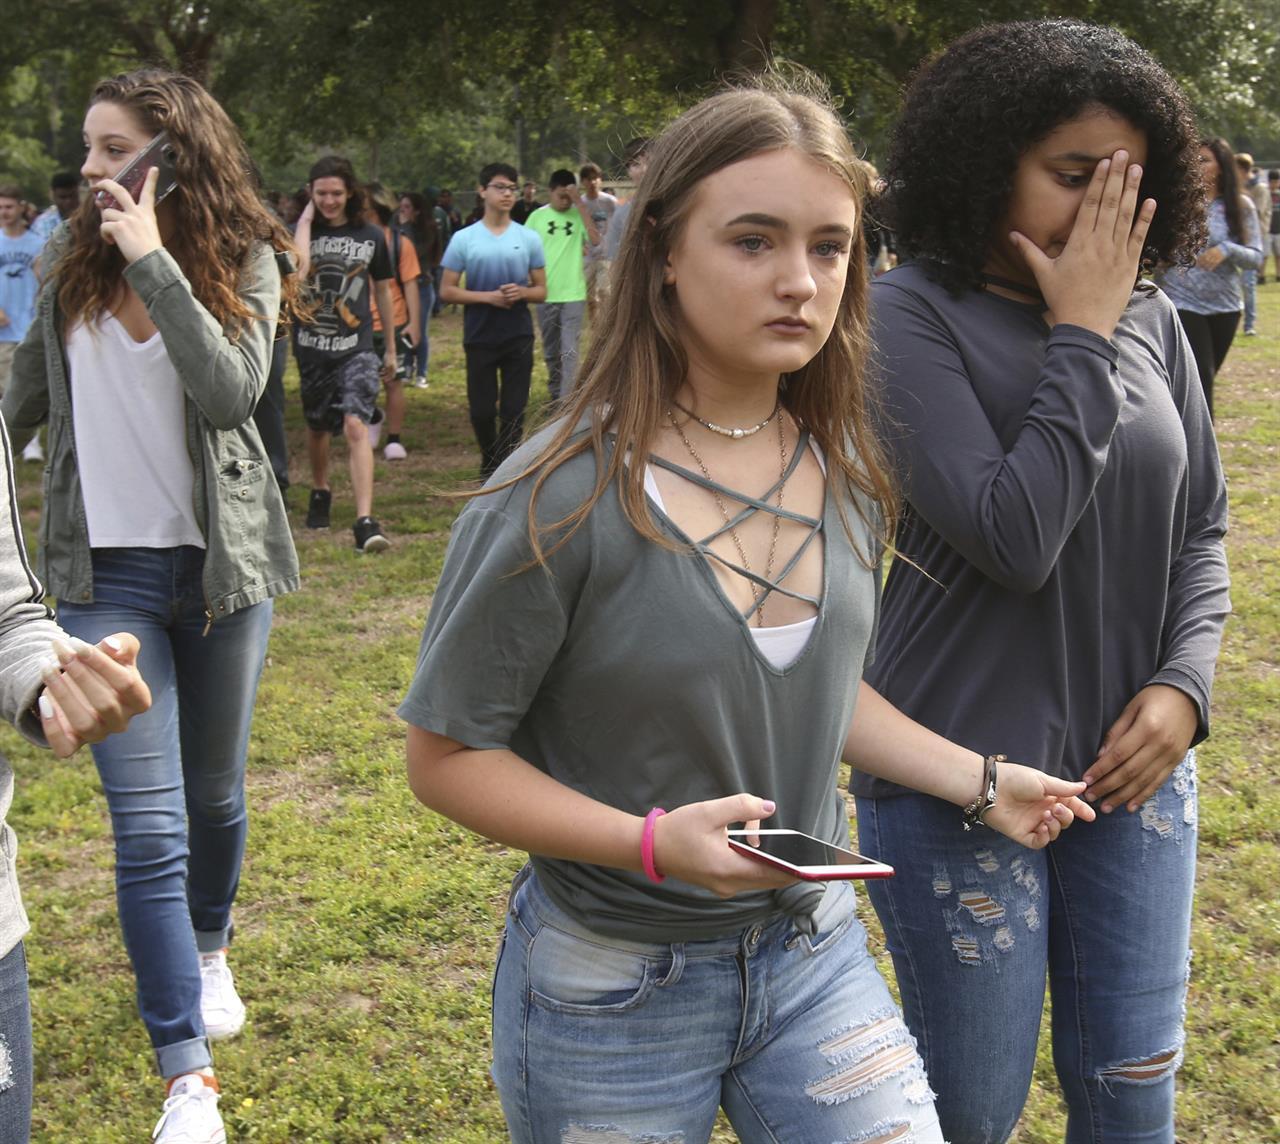 Official: Shotgun In Guitar Case Was Used In School